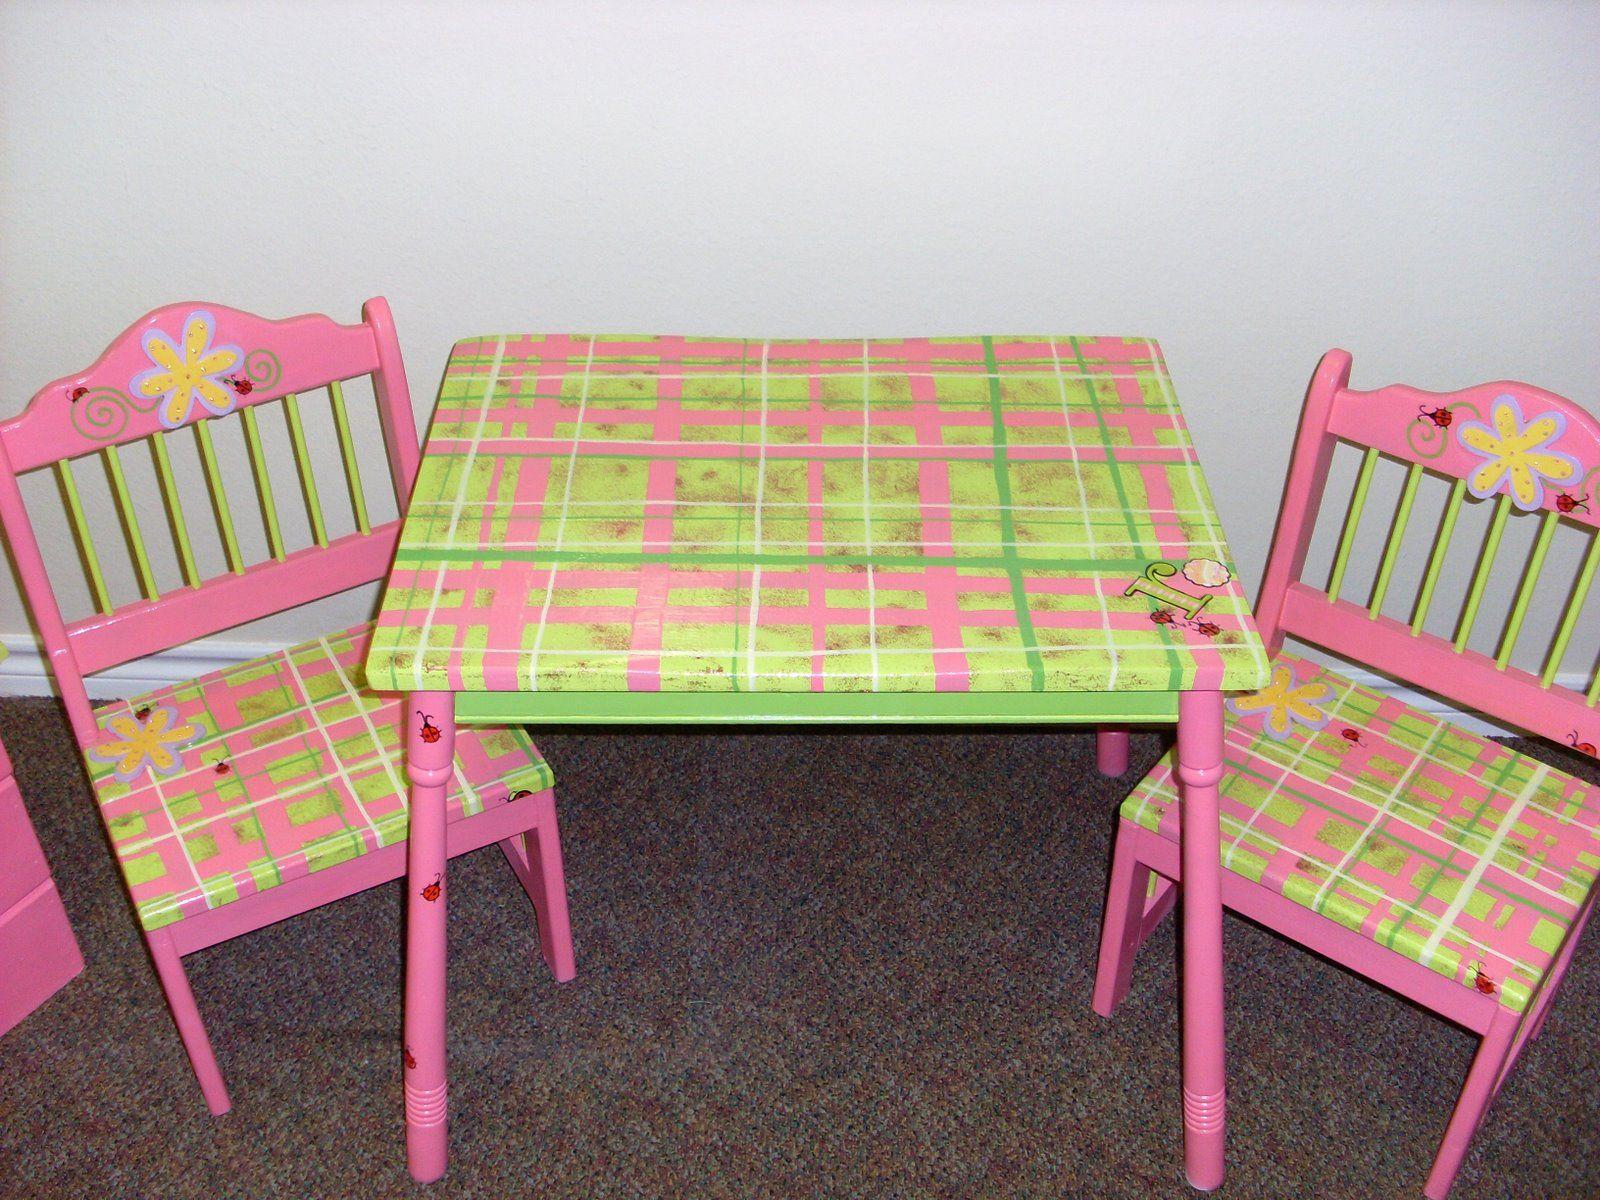 Painted furniture pinterest rachael edwards for Pinterest painted furniture